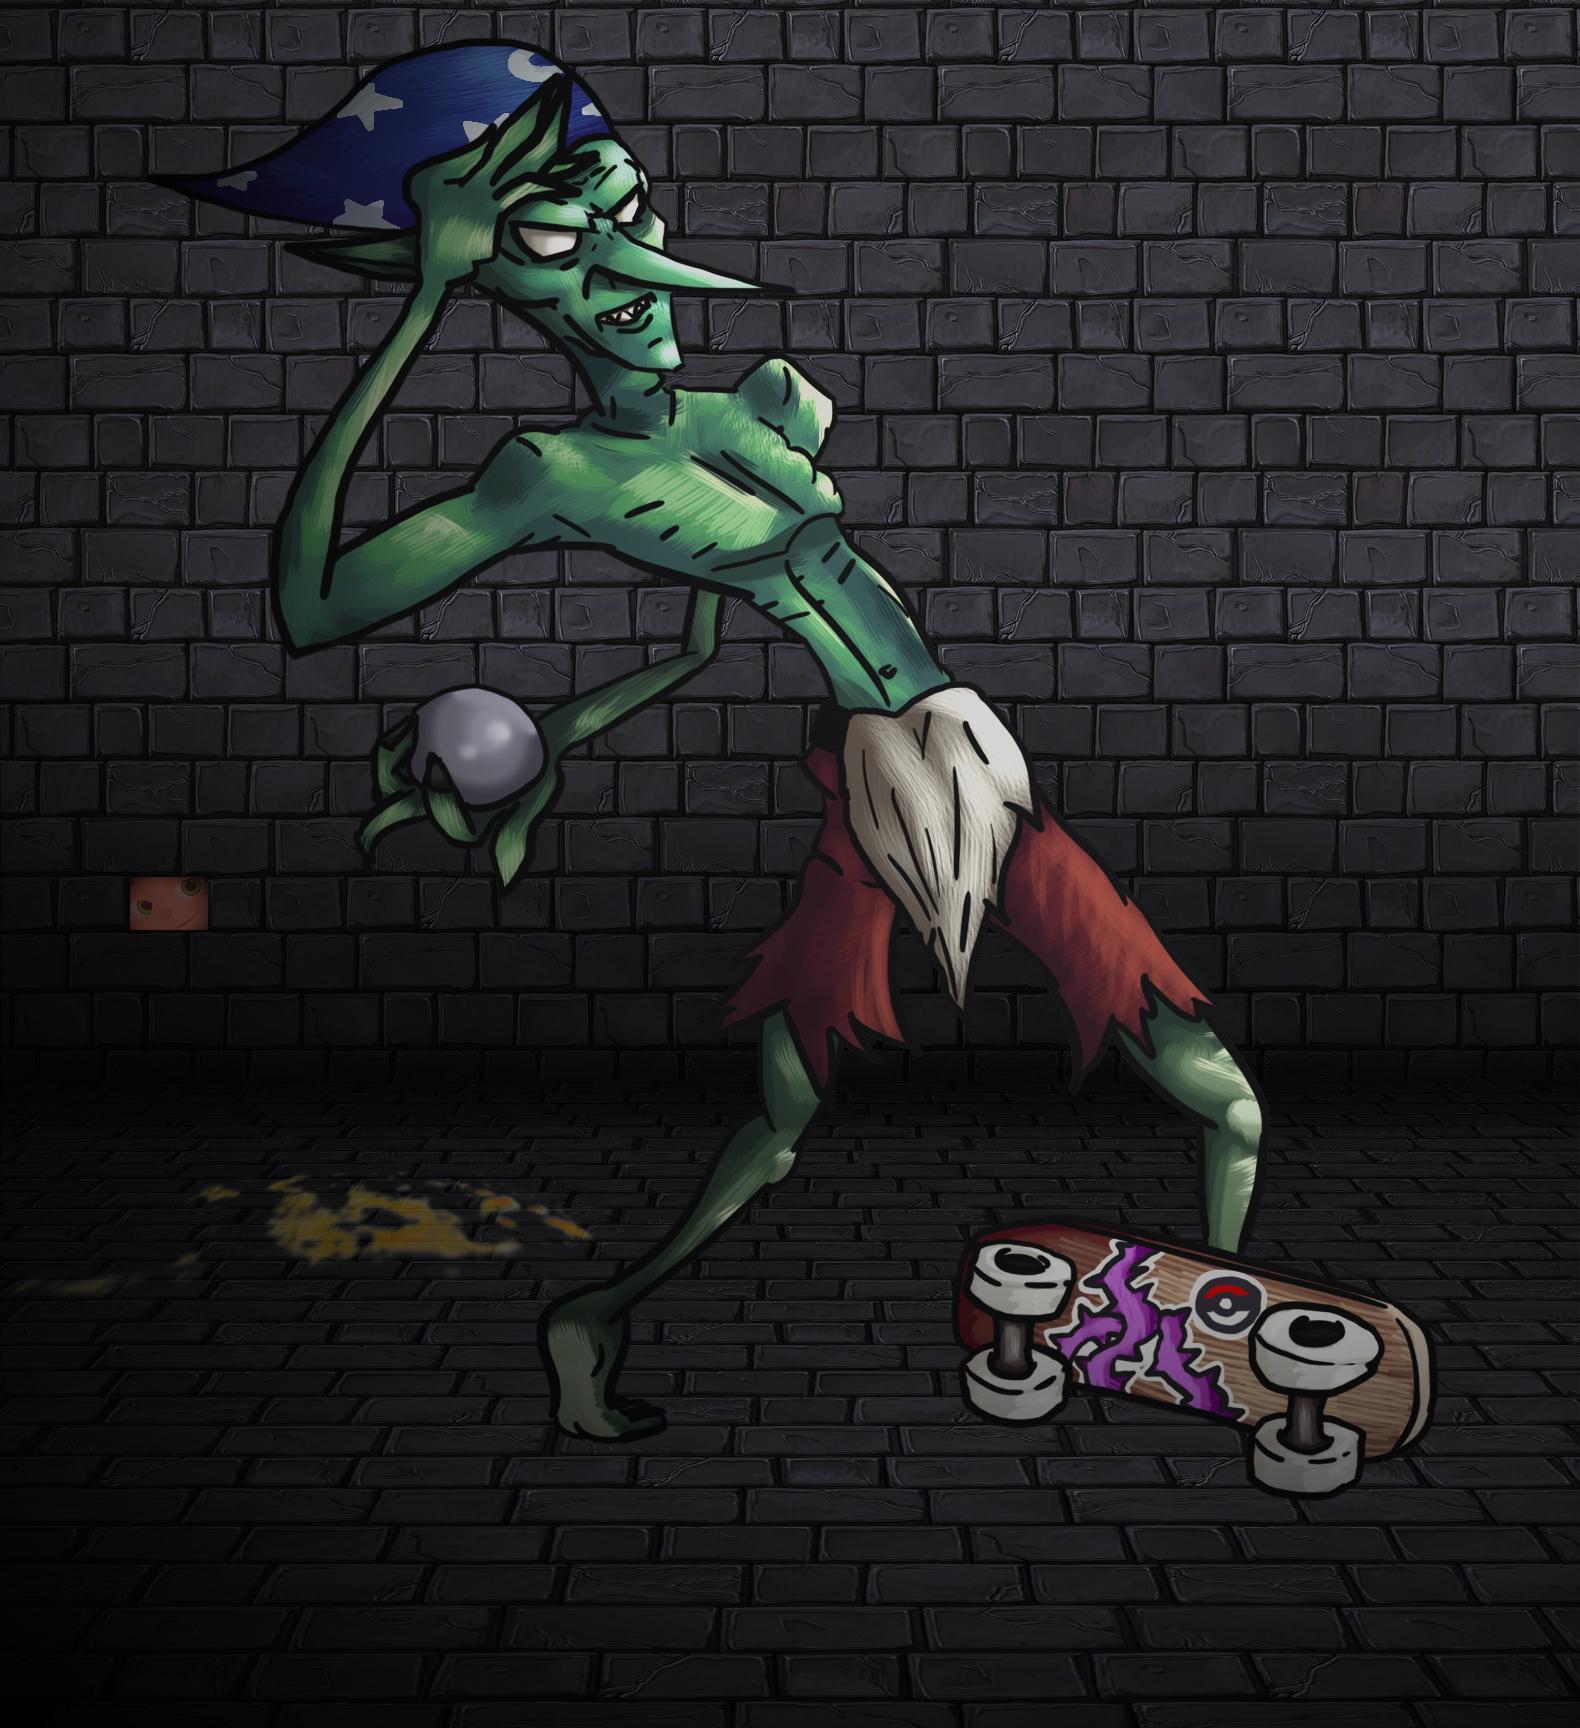 Geoff the Goblin